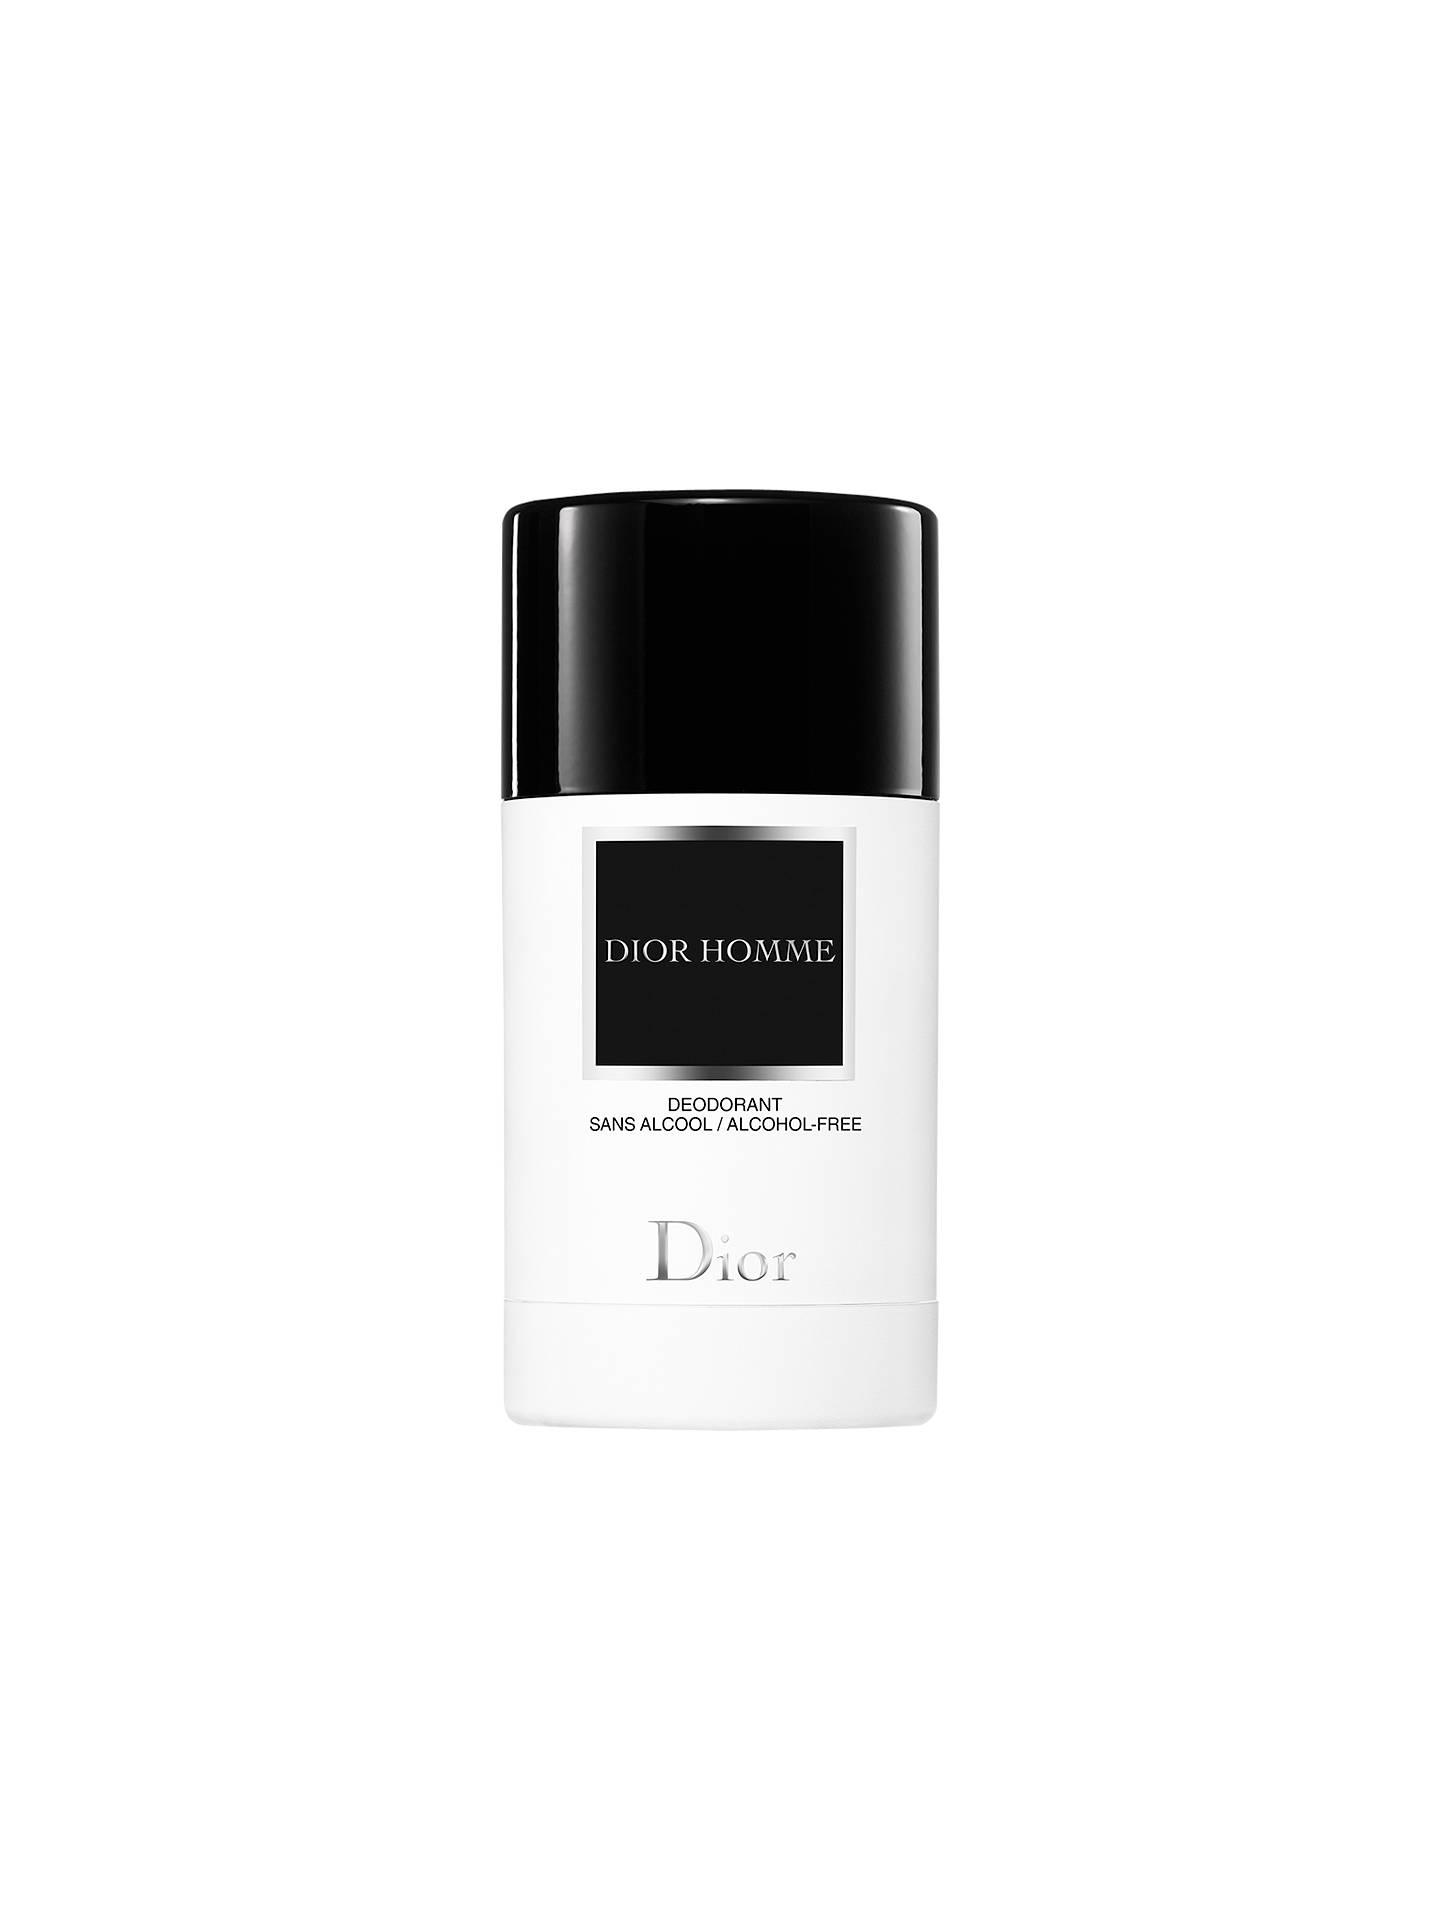 ef945fa3ed361d Buy Dior Homme Deodorant Stick, 75g Online at johnlewis.com